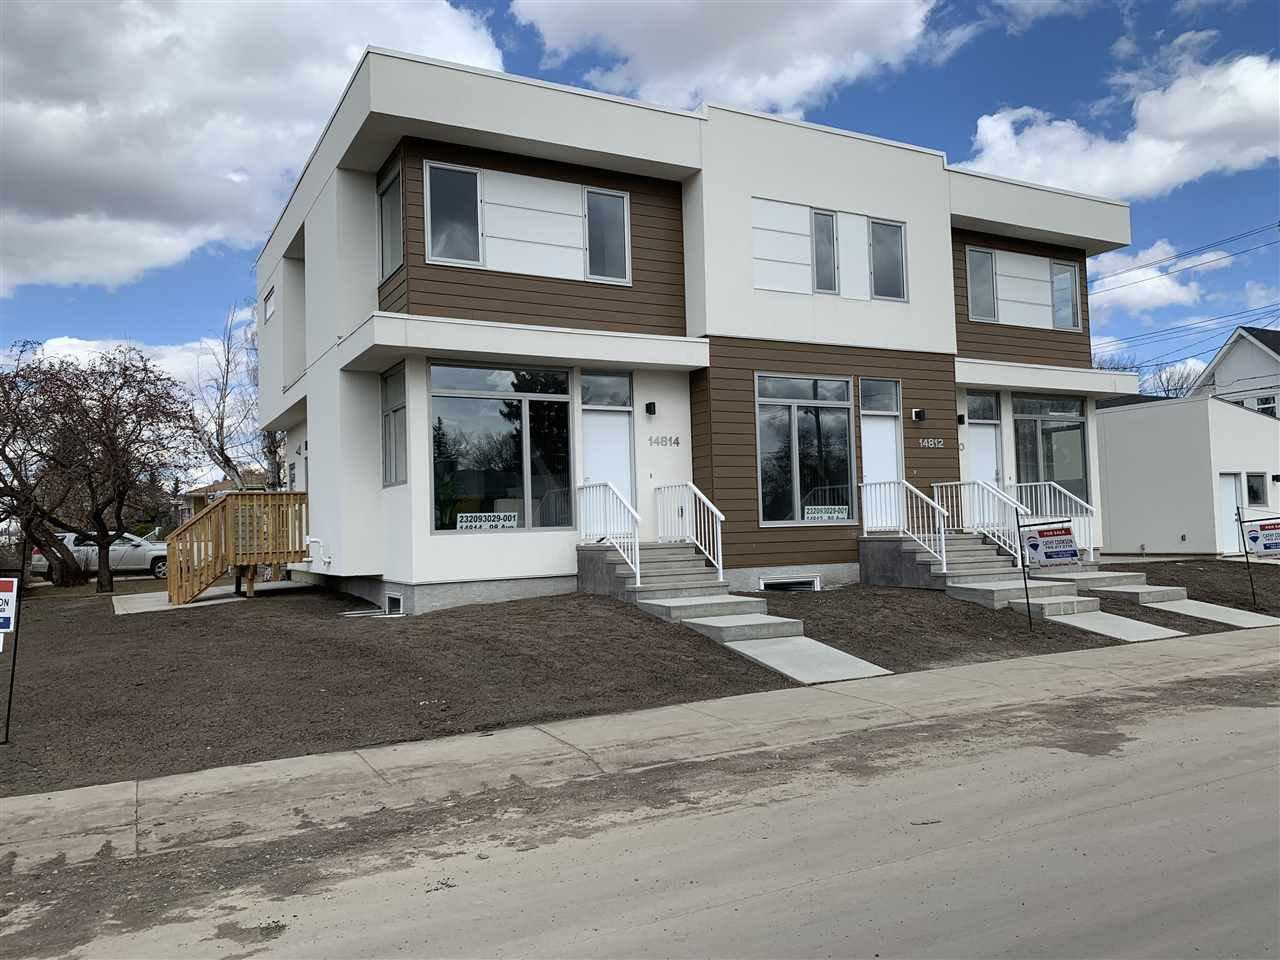 Main Photo: 14810 98 Avenue in Edmonton: Zone 10 Townhouse for sale : MLS®# E4194020